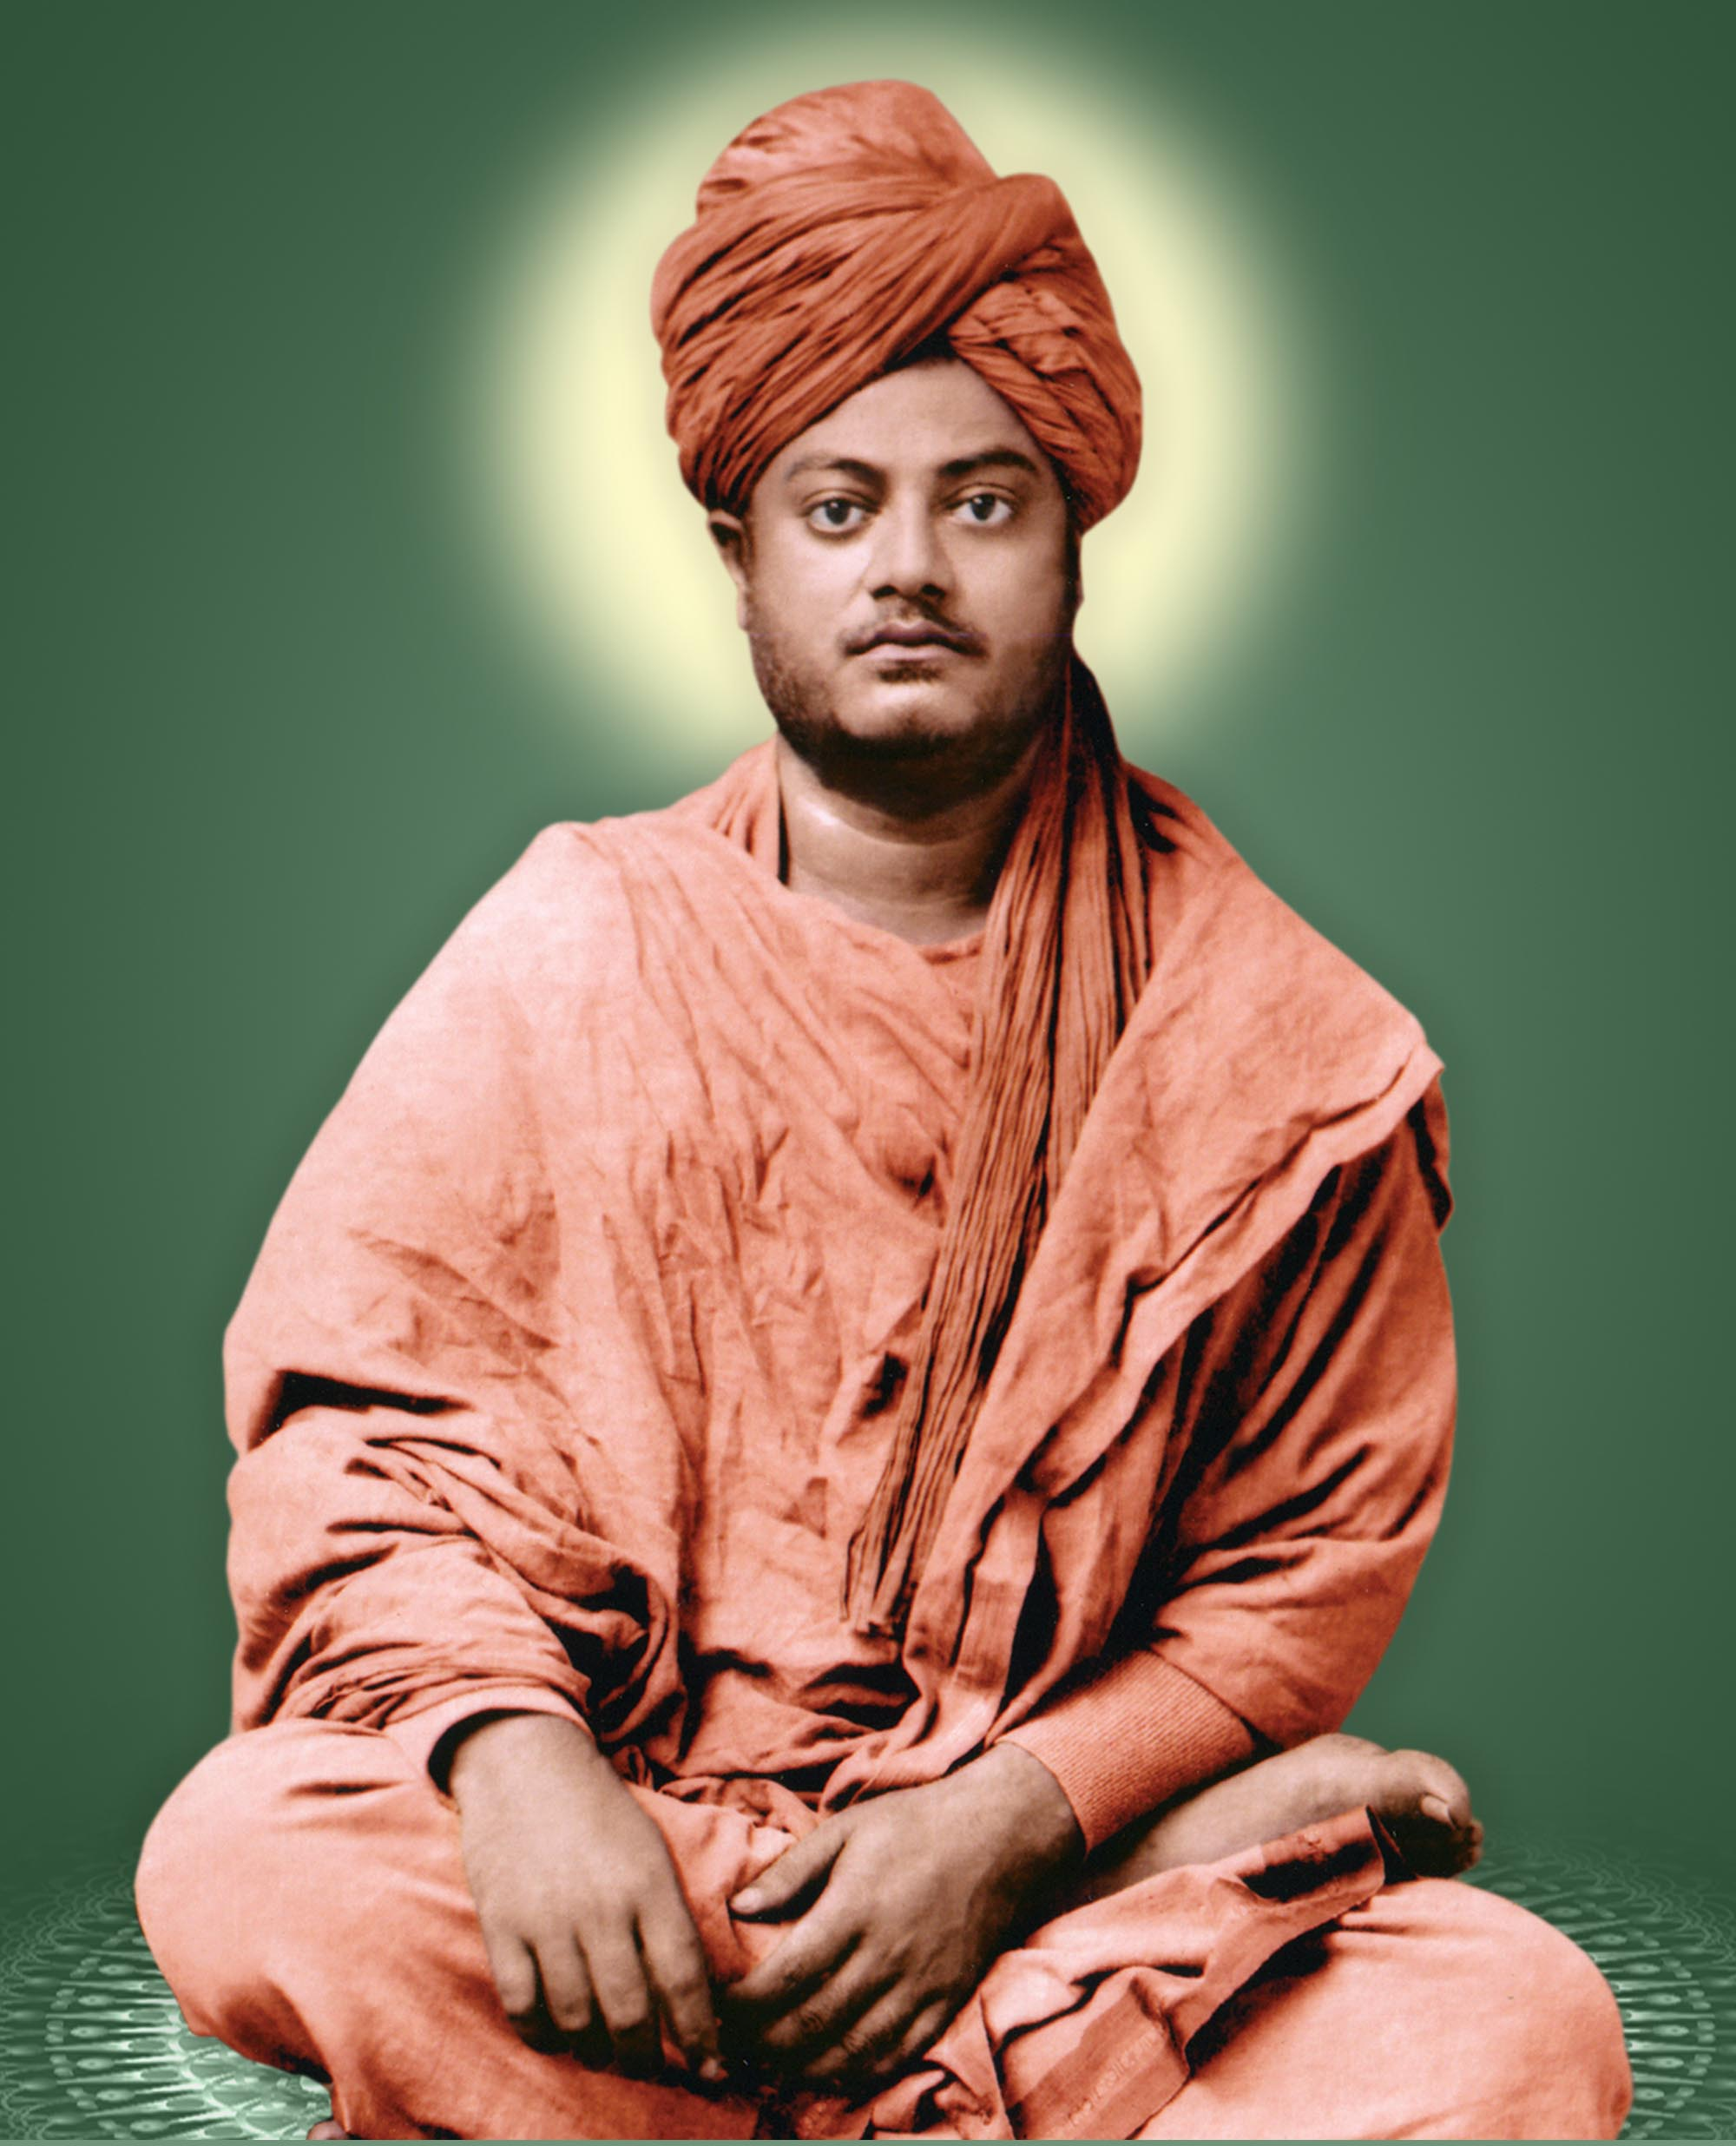 Quotes Vivekananda: Quotes By Swami Vivekananda